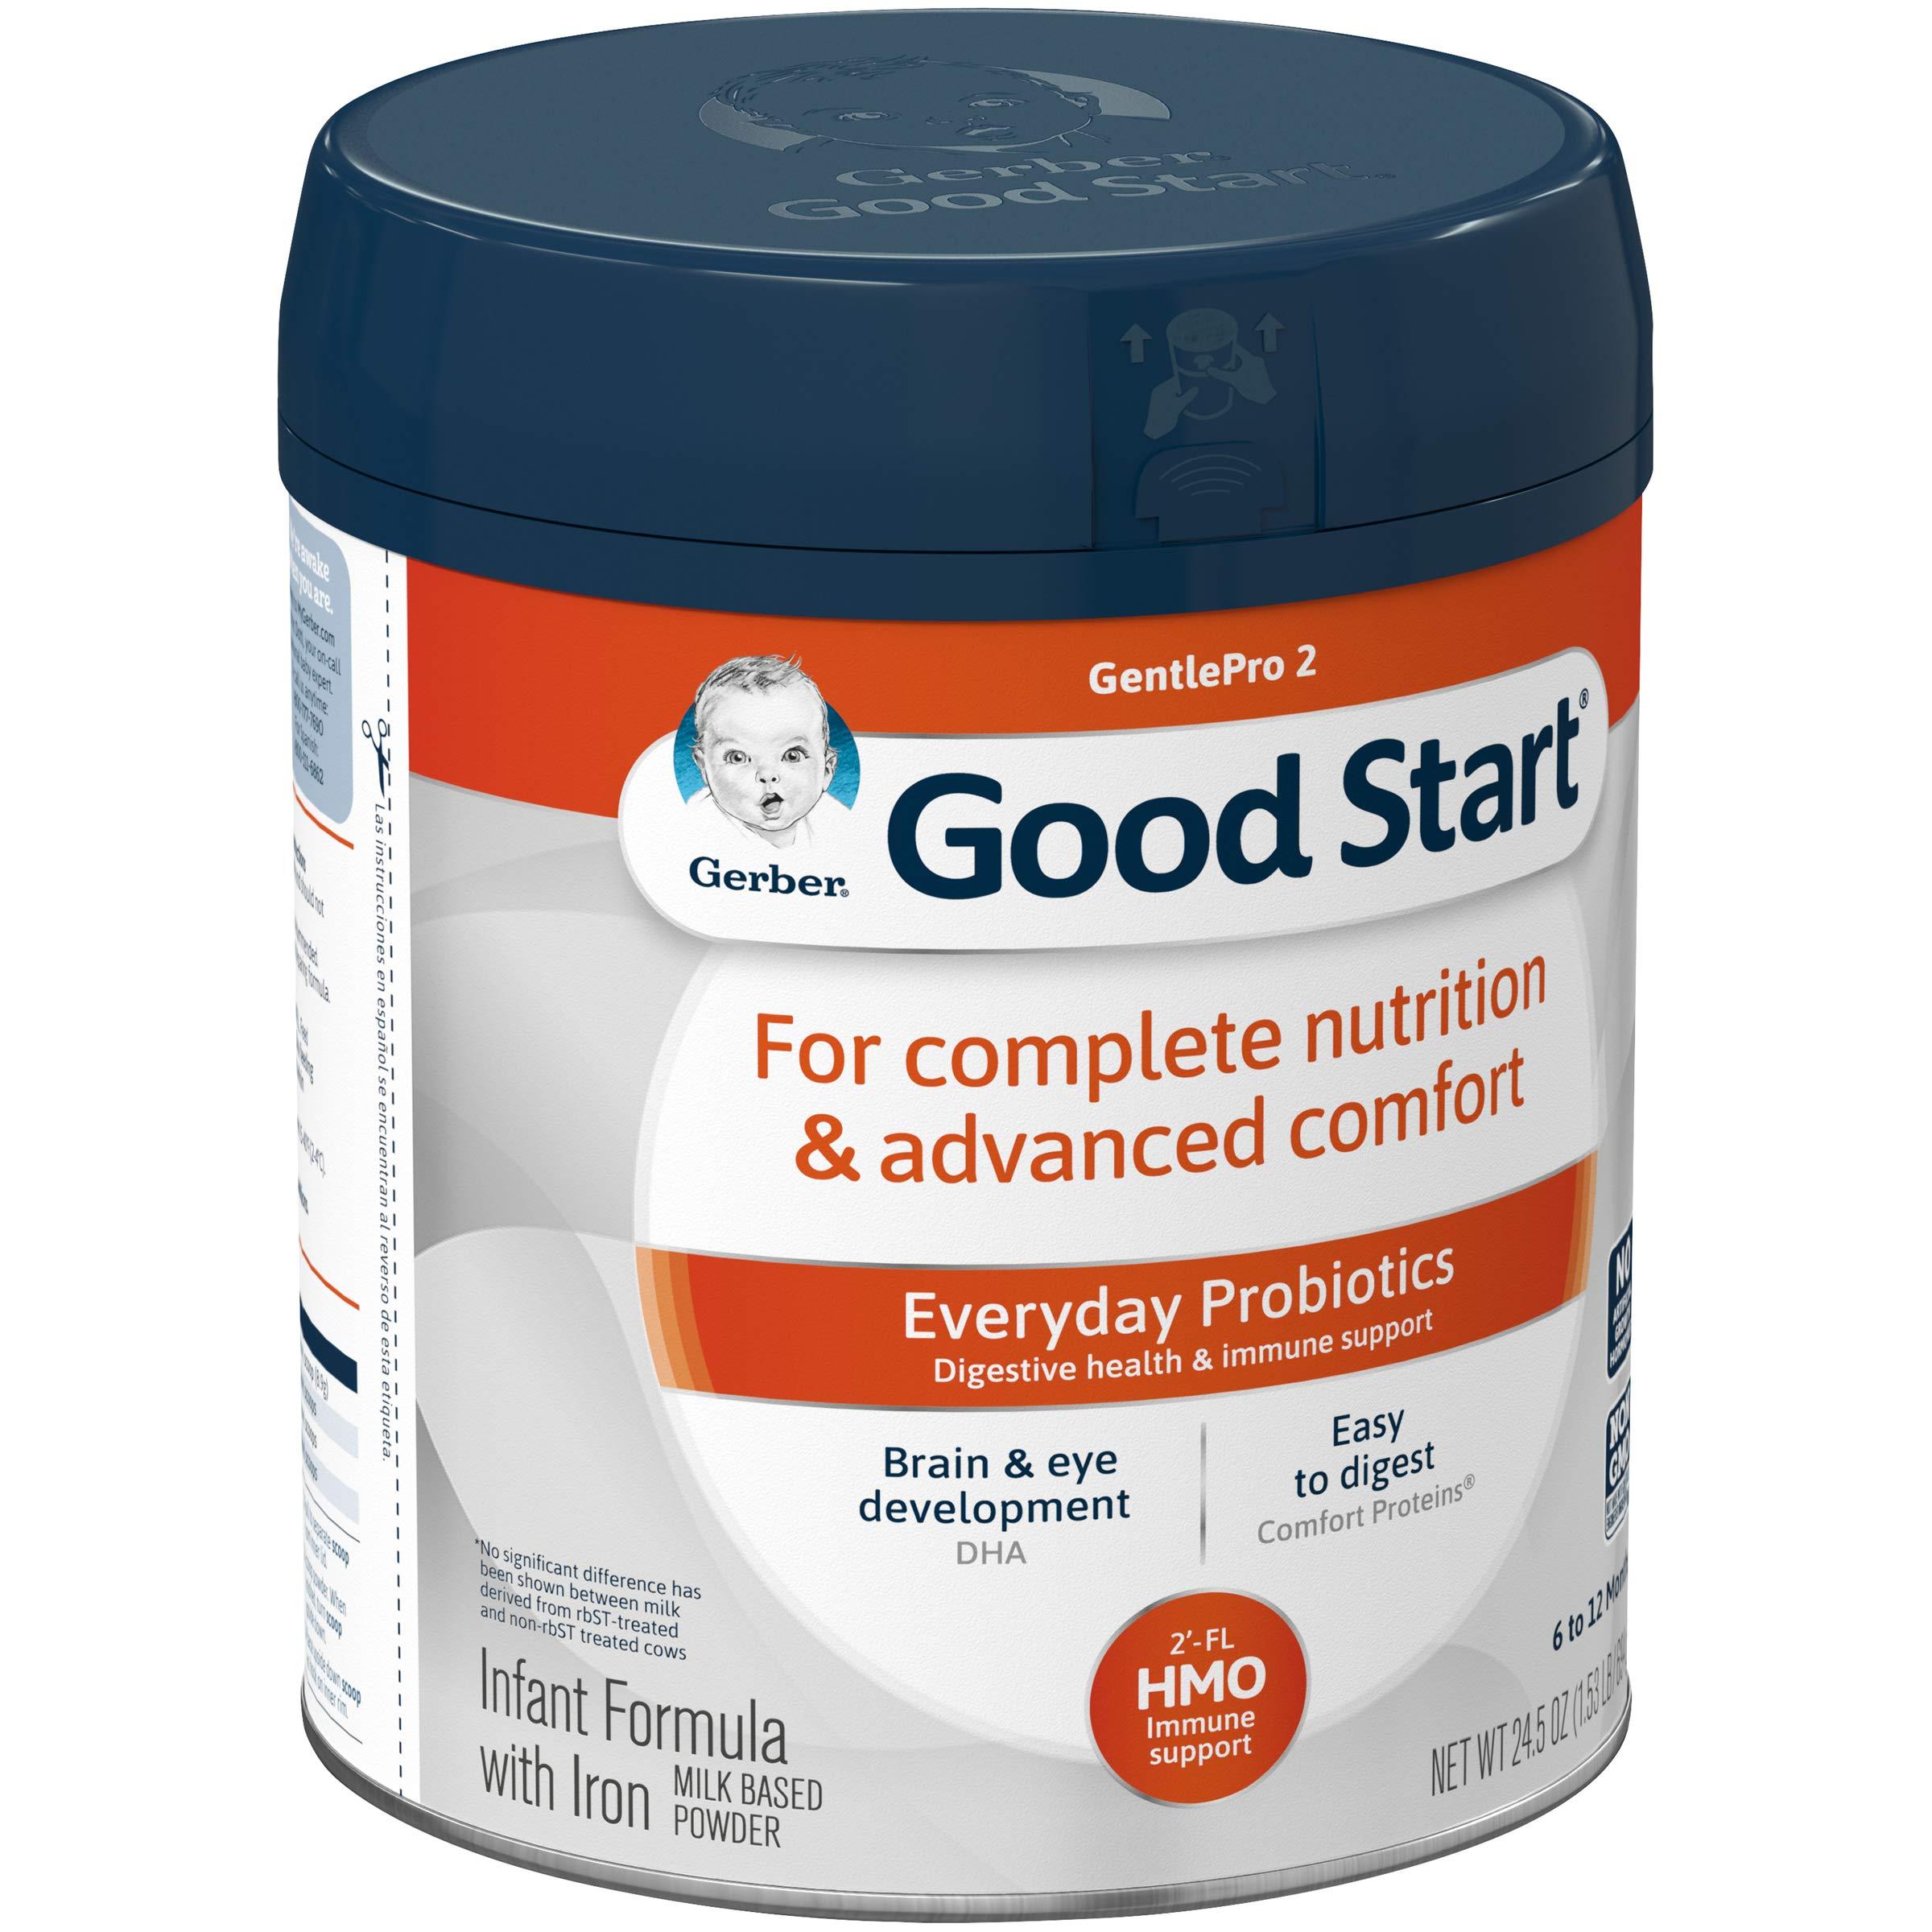 Gerber Good Start Infant Formula Gentle (HMO) Non-Gmo Powder Infant Formula, Stage 2, 24.5 Ounce, 4 Count by Good Start (Image #4)